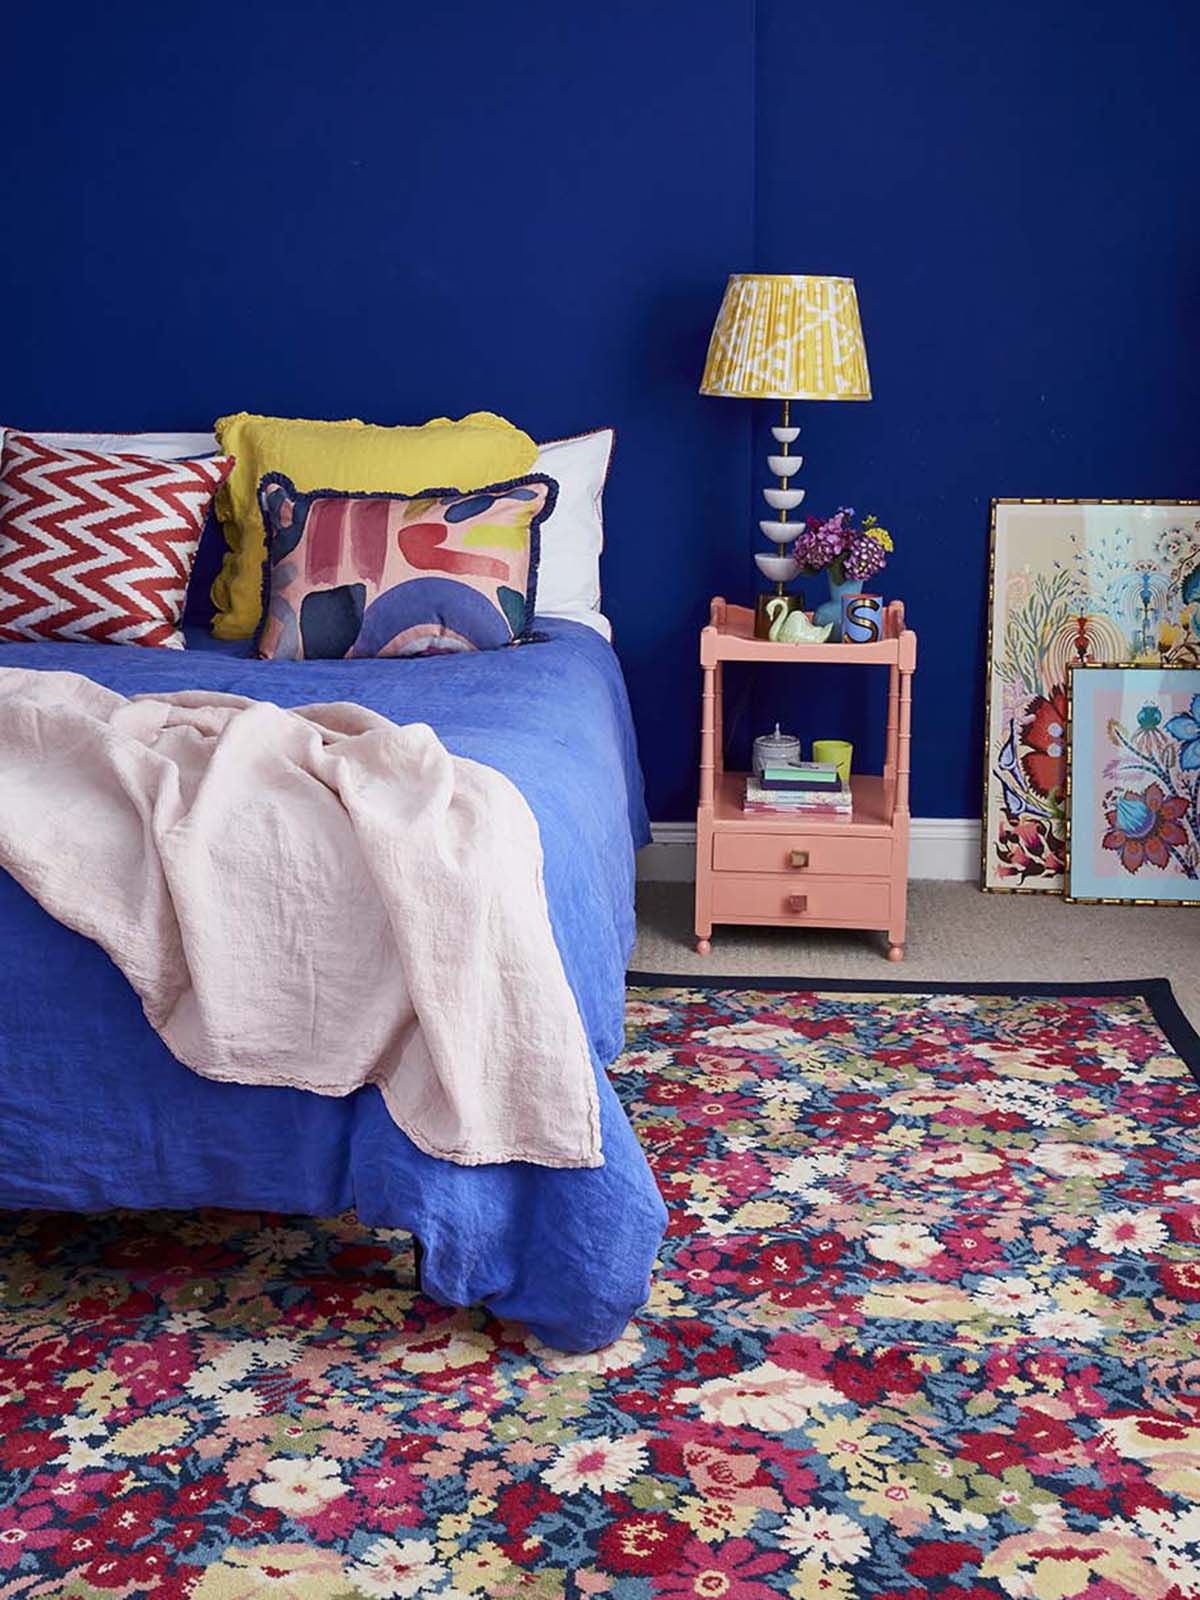 Alternative Flooring rug in the bedroom of interior designer sophie robinson. Liberty flowers of thorpe summer garden rug by Alternative flooring in a deep blue berdoom painted smalt by little greene.